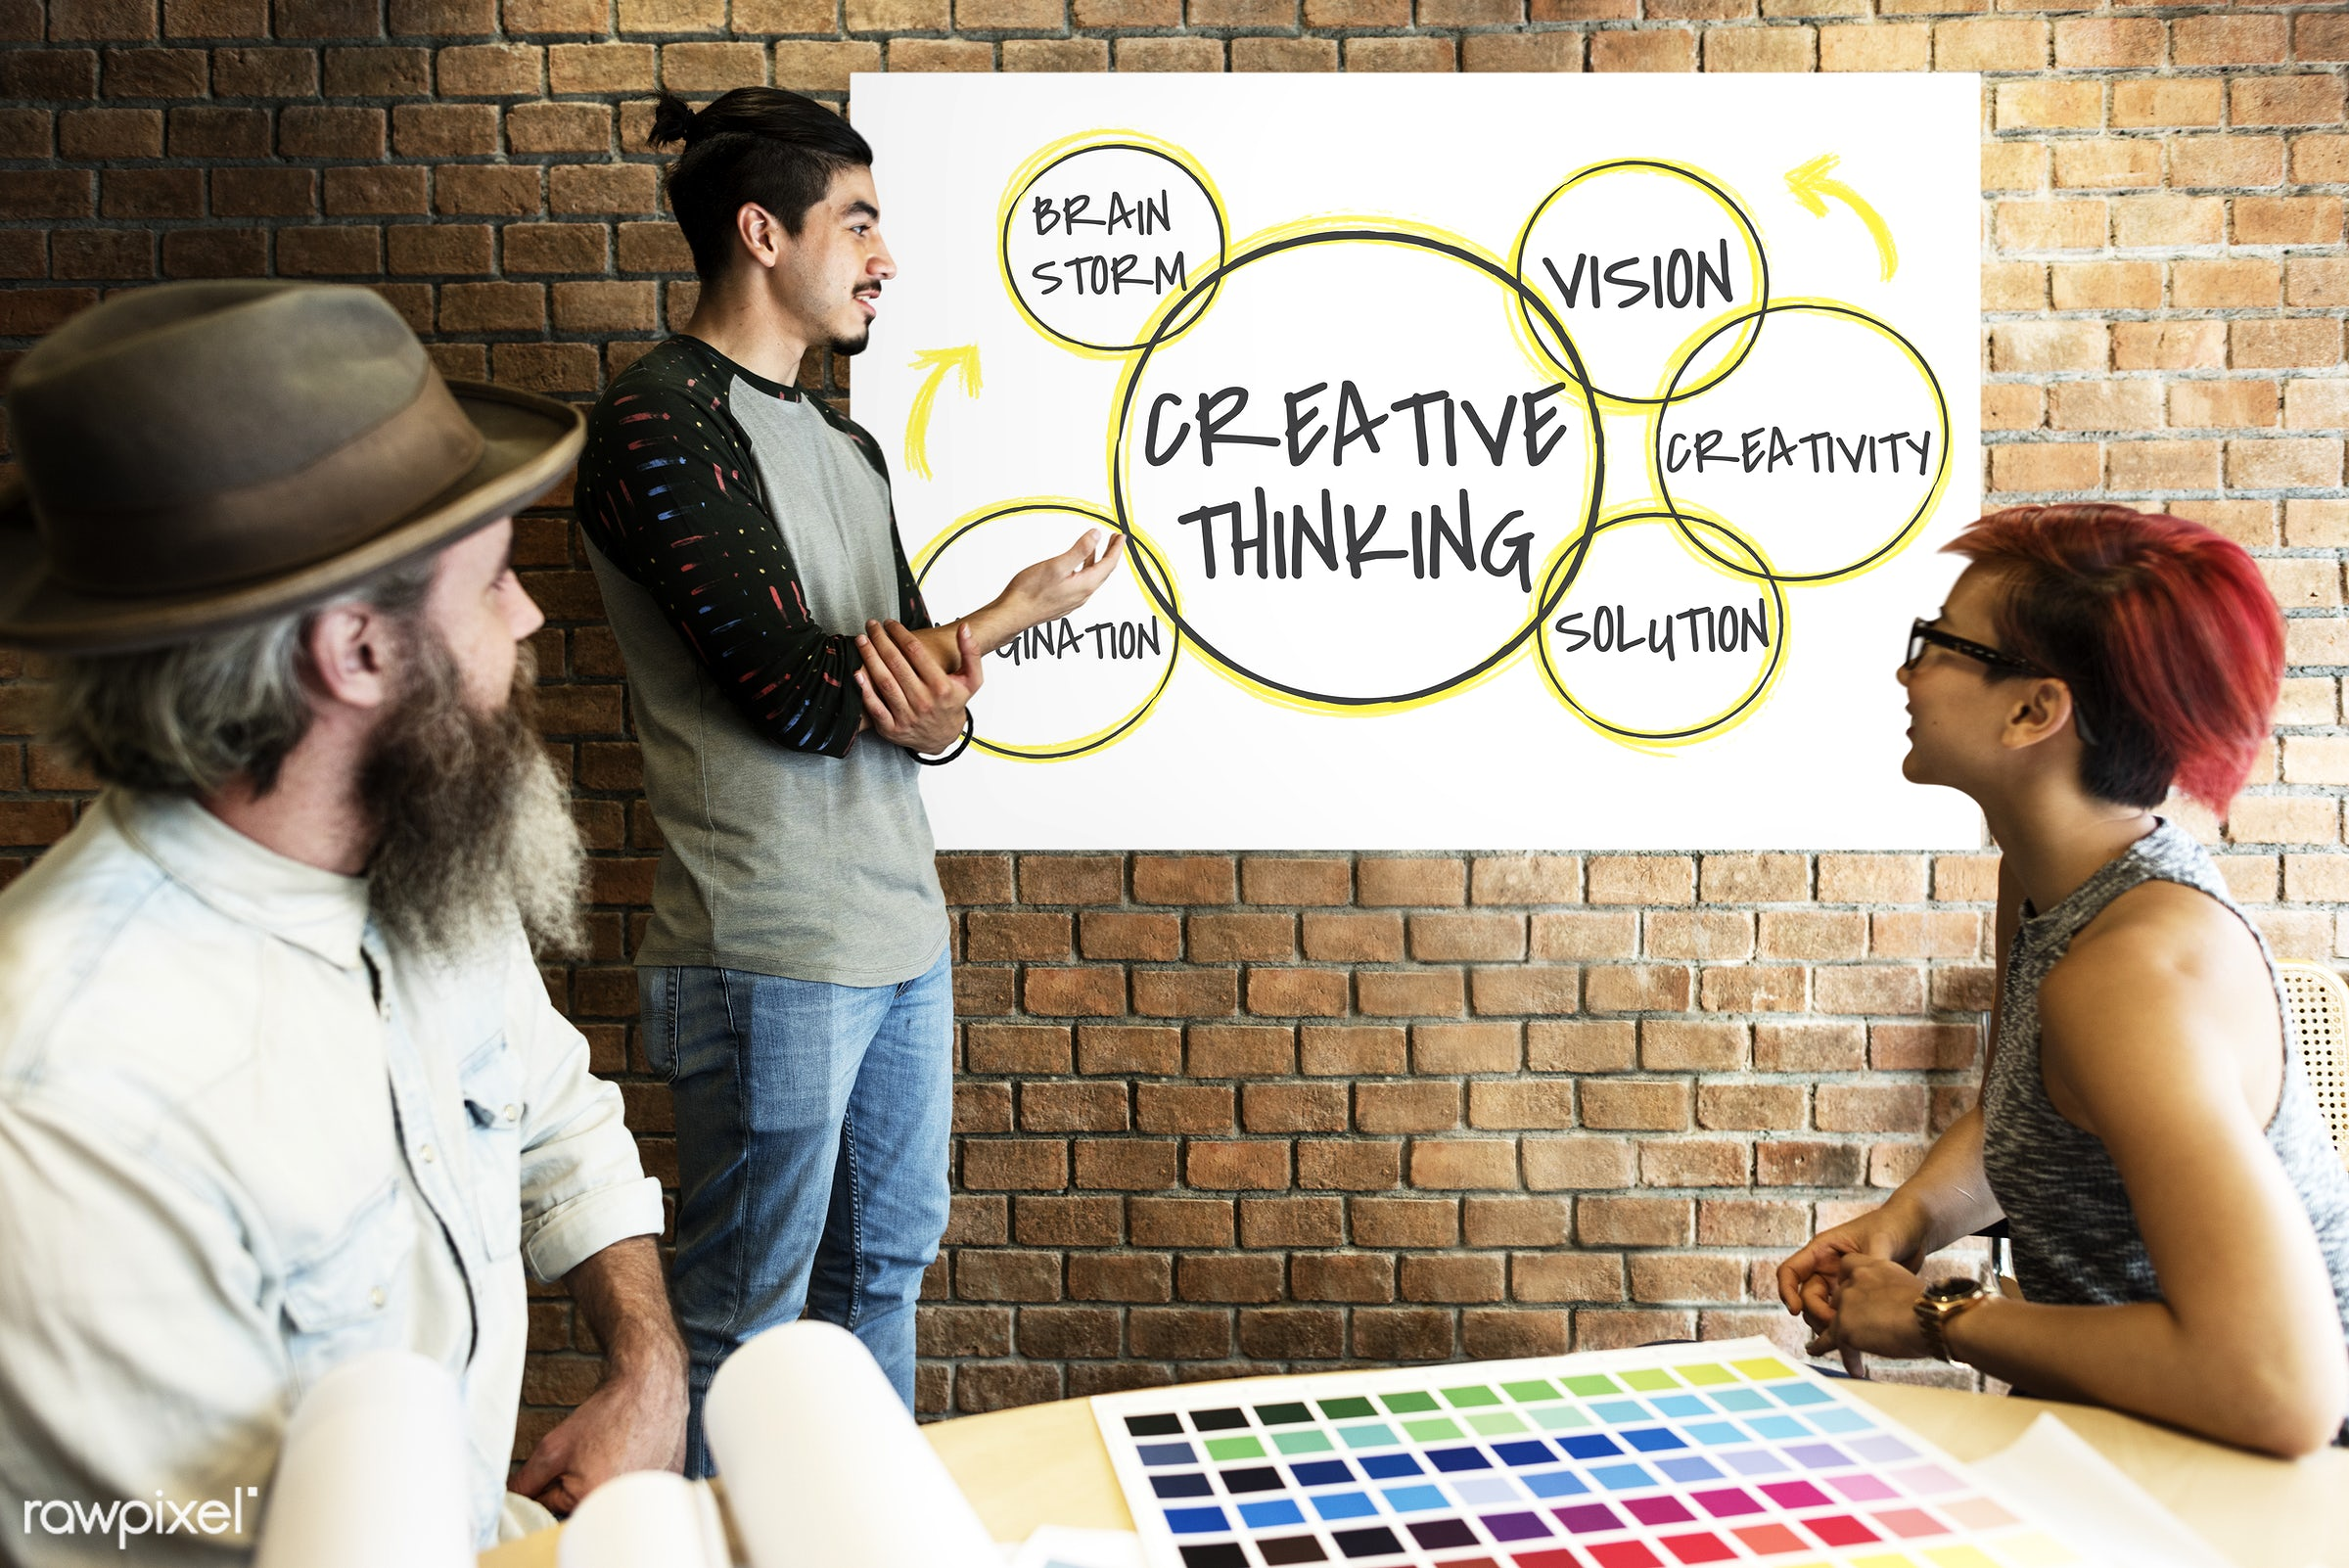 art, be creative, beard, board, brainstorm, brick wall, chart, circle, color chart, colors, connection, creative, creative...